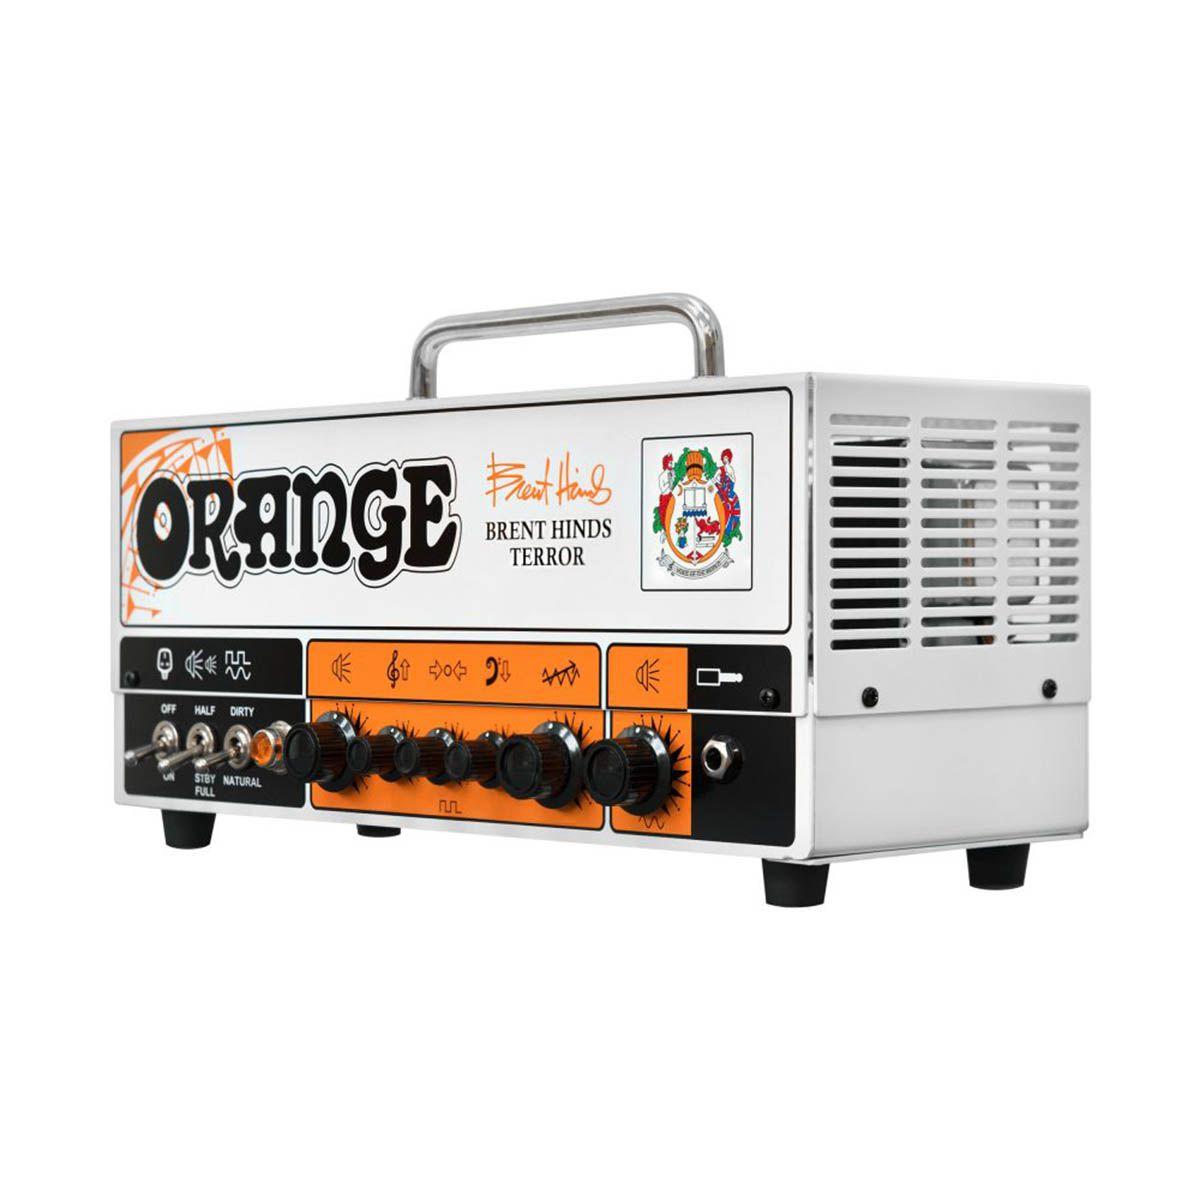 Cabeçote Orange Brent Hinds Terror 15W para Guitarra